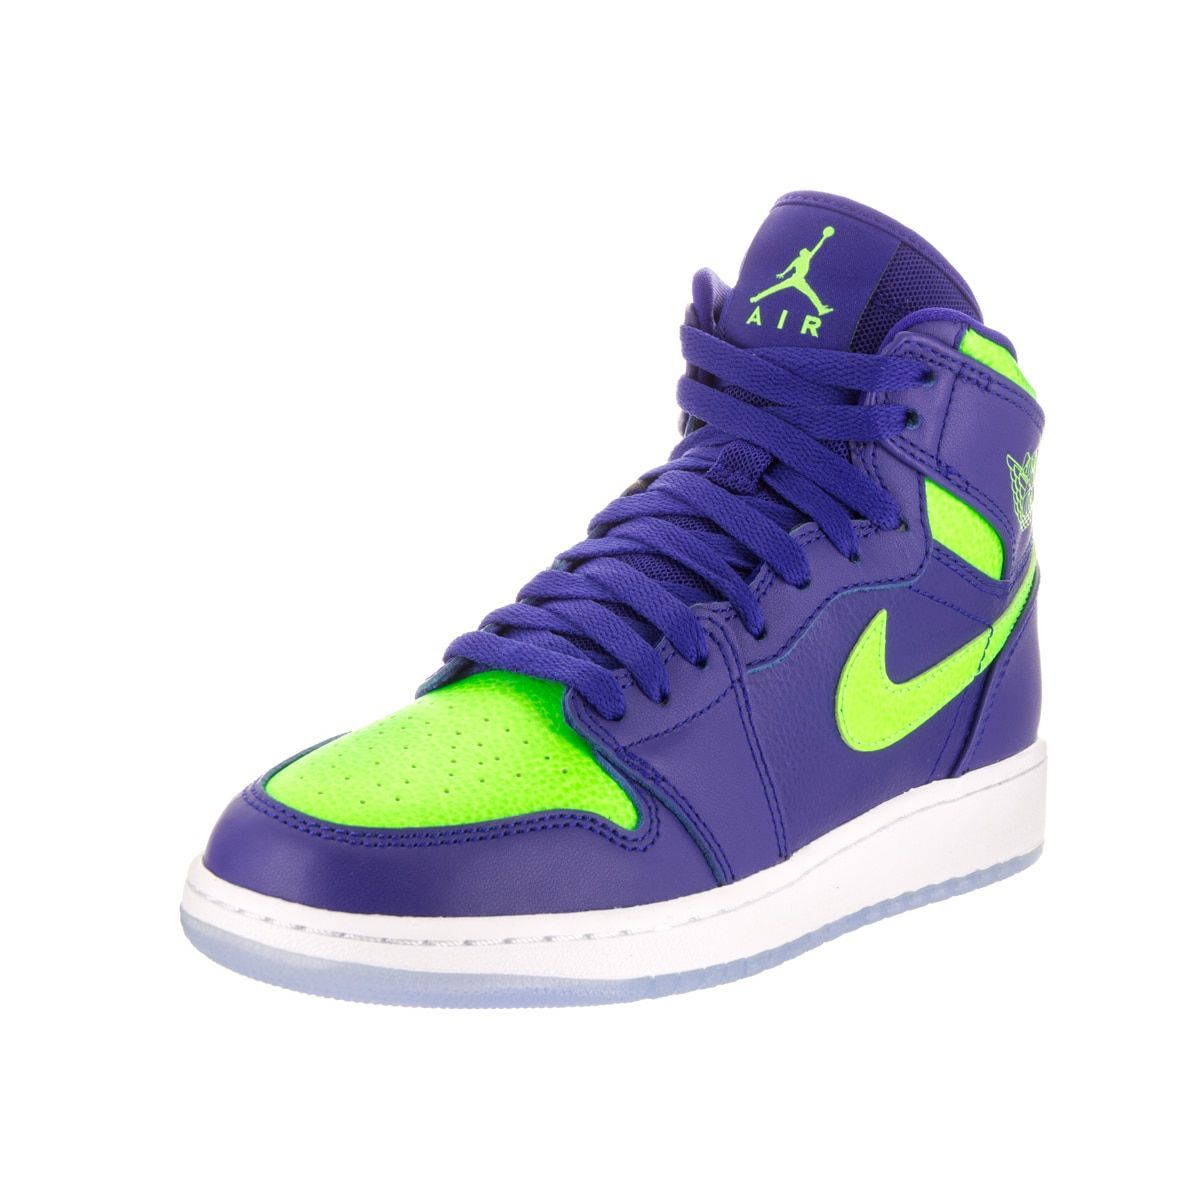 new style 3adb8 70cfe Nike Jordan Kids Air Jordan 1 Retro Blue and Green High-top ...